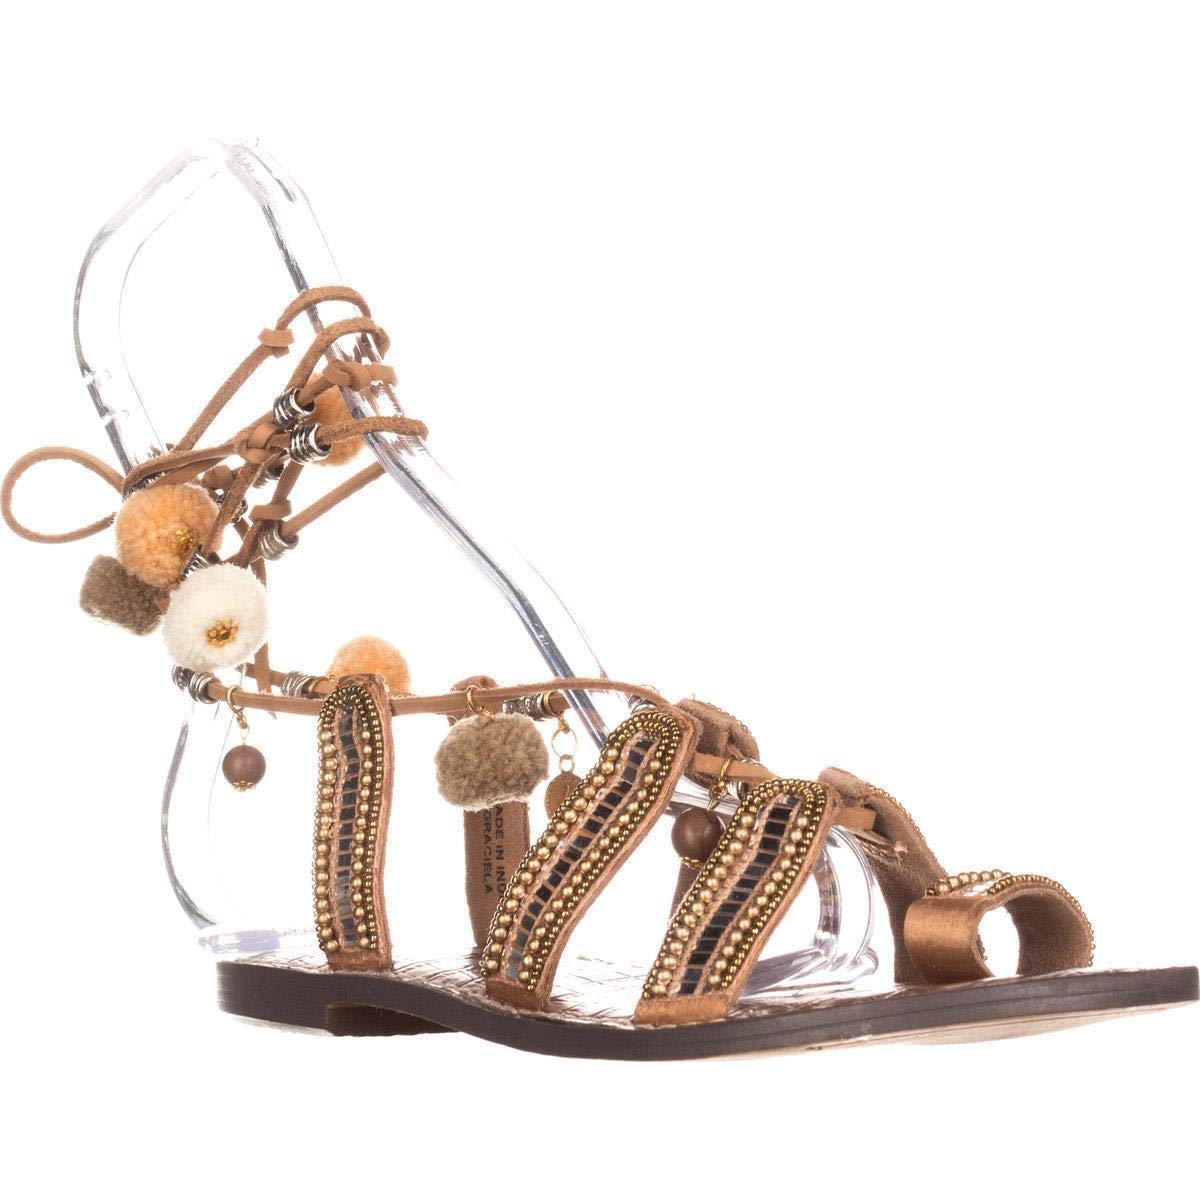 Saddle Leather Sam Edelman Graciela Flat Lace-Up Sandals, Saddle Leather